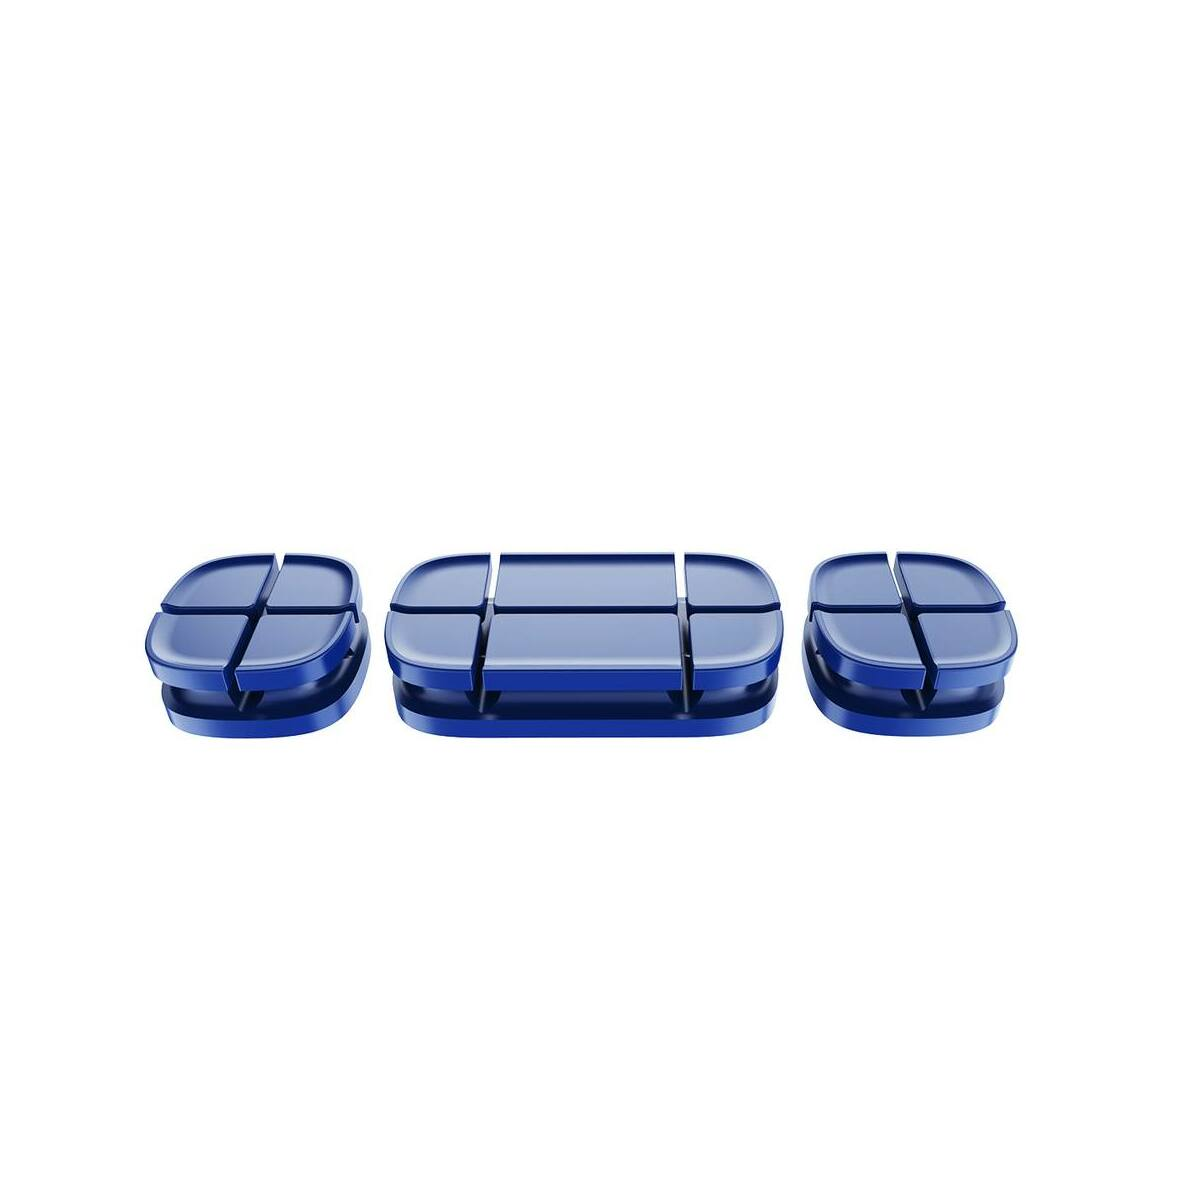 Baseus Cross Peas kábelrendező, kék (ACTDJ-03)